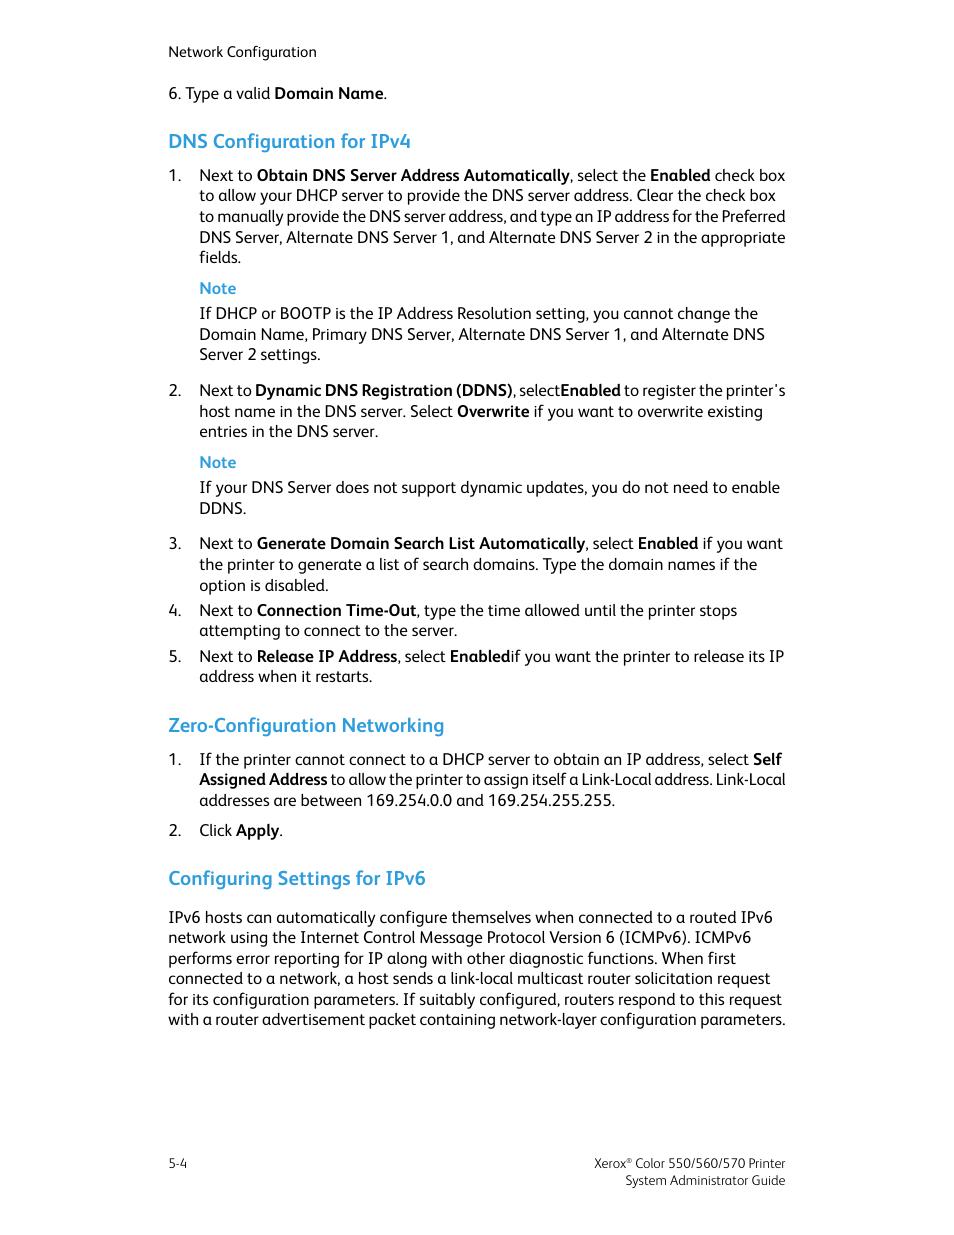 Dns configuration for ipv4, Zero-configuration networking